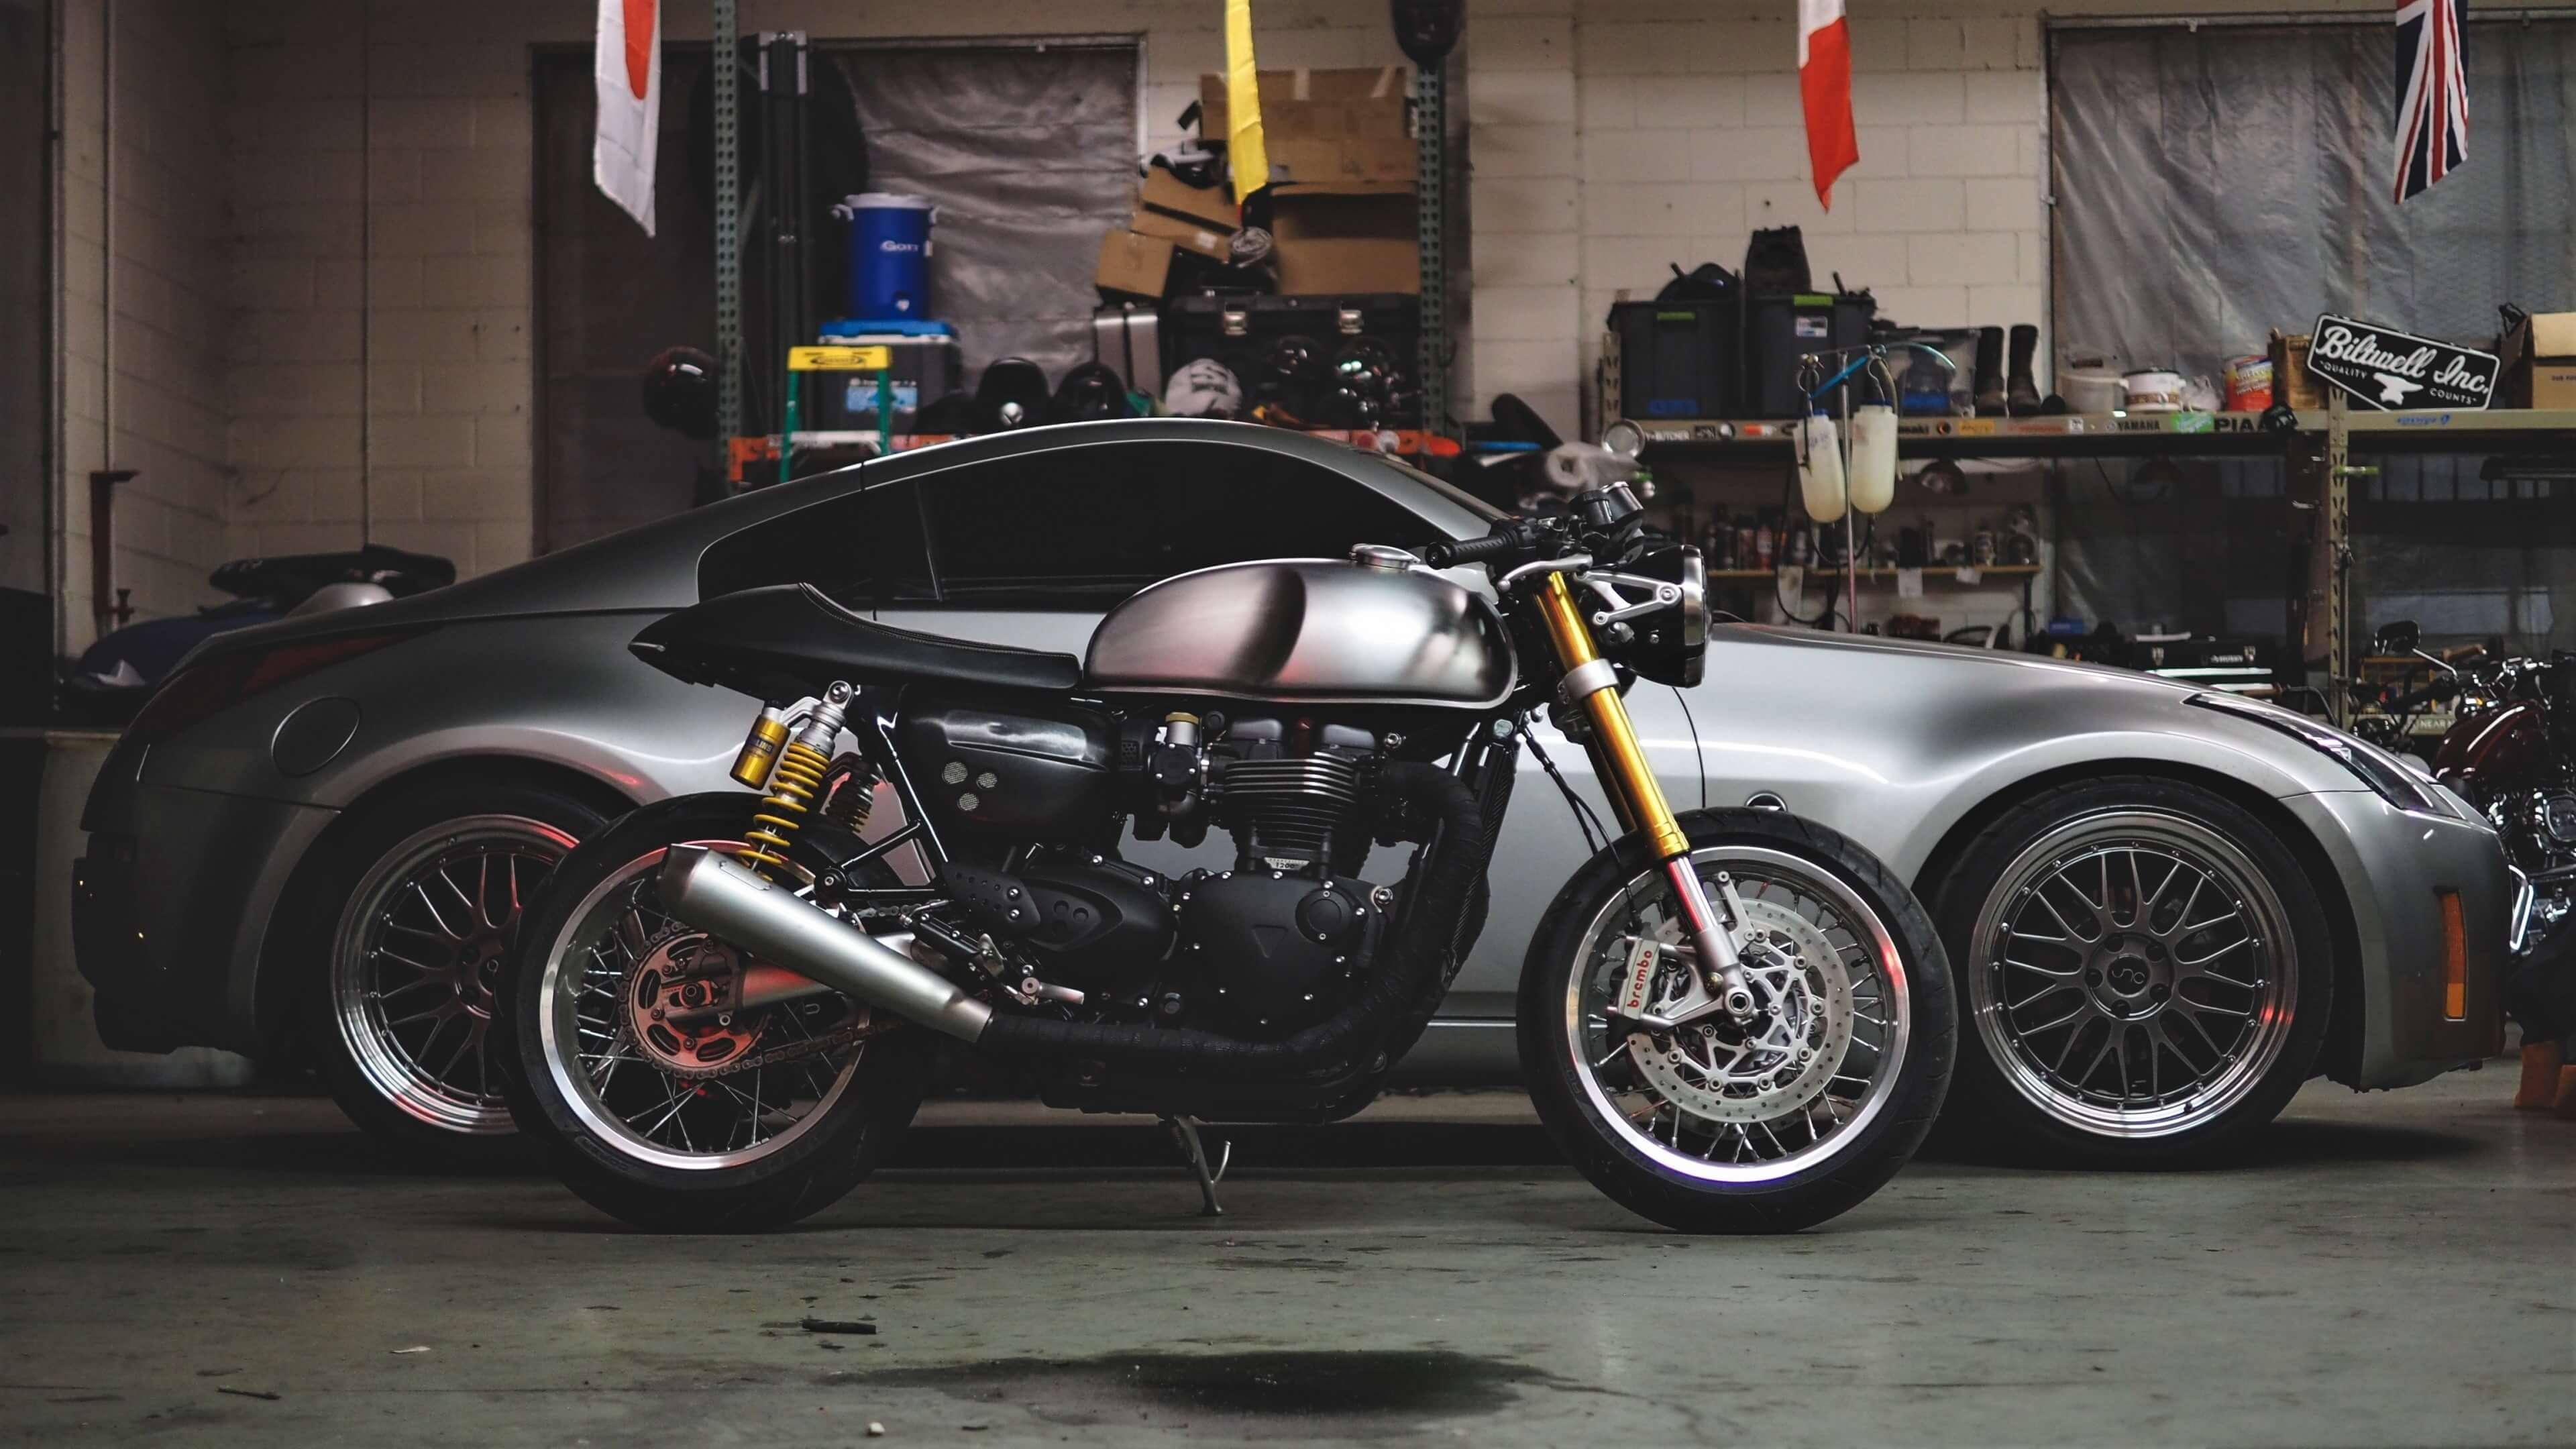 motorcycle vehicle silver garage shipping